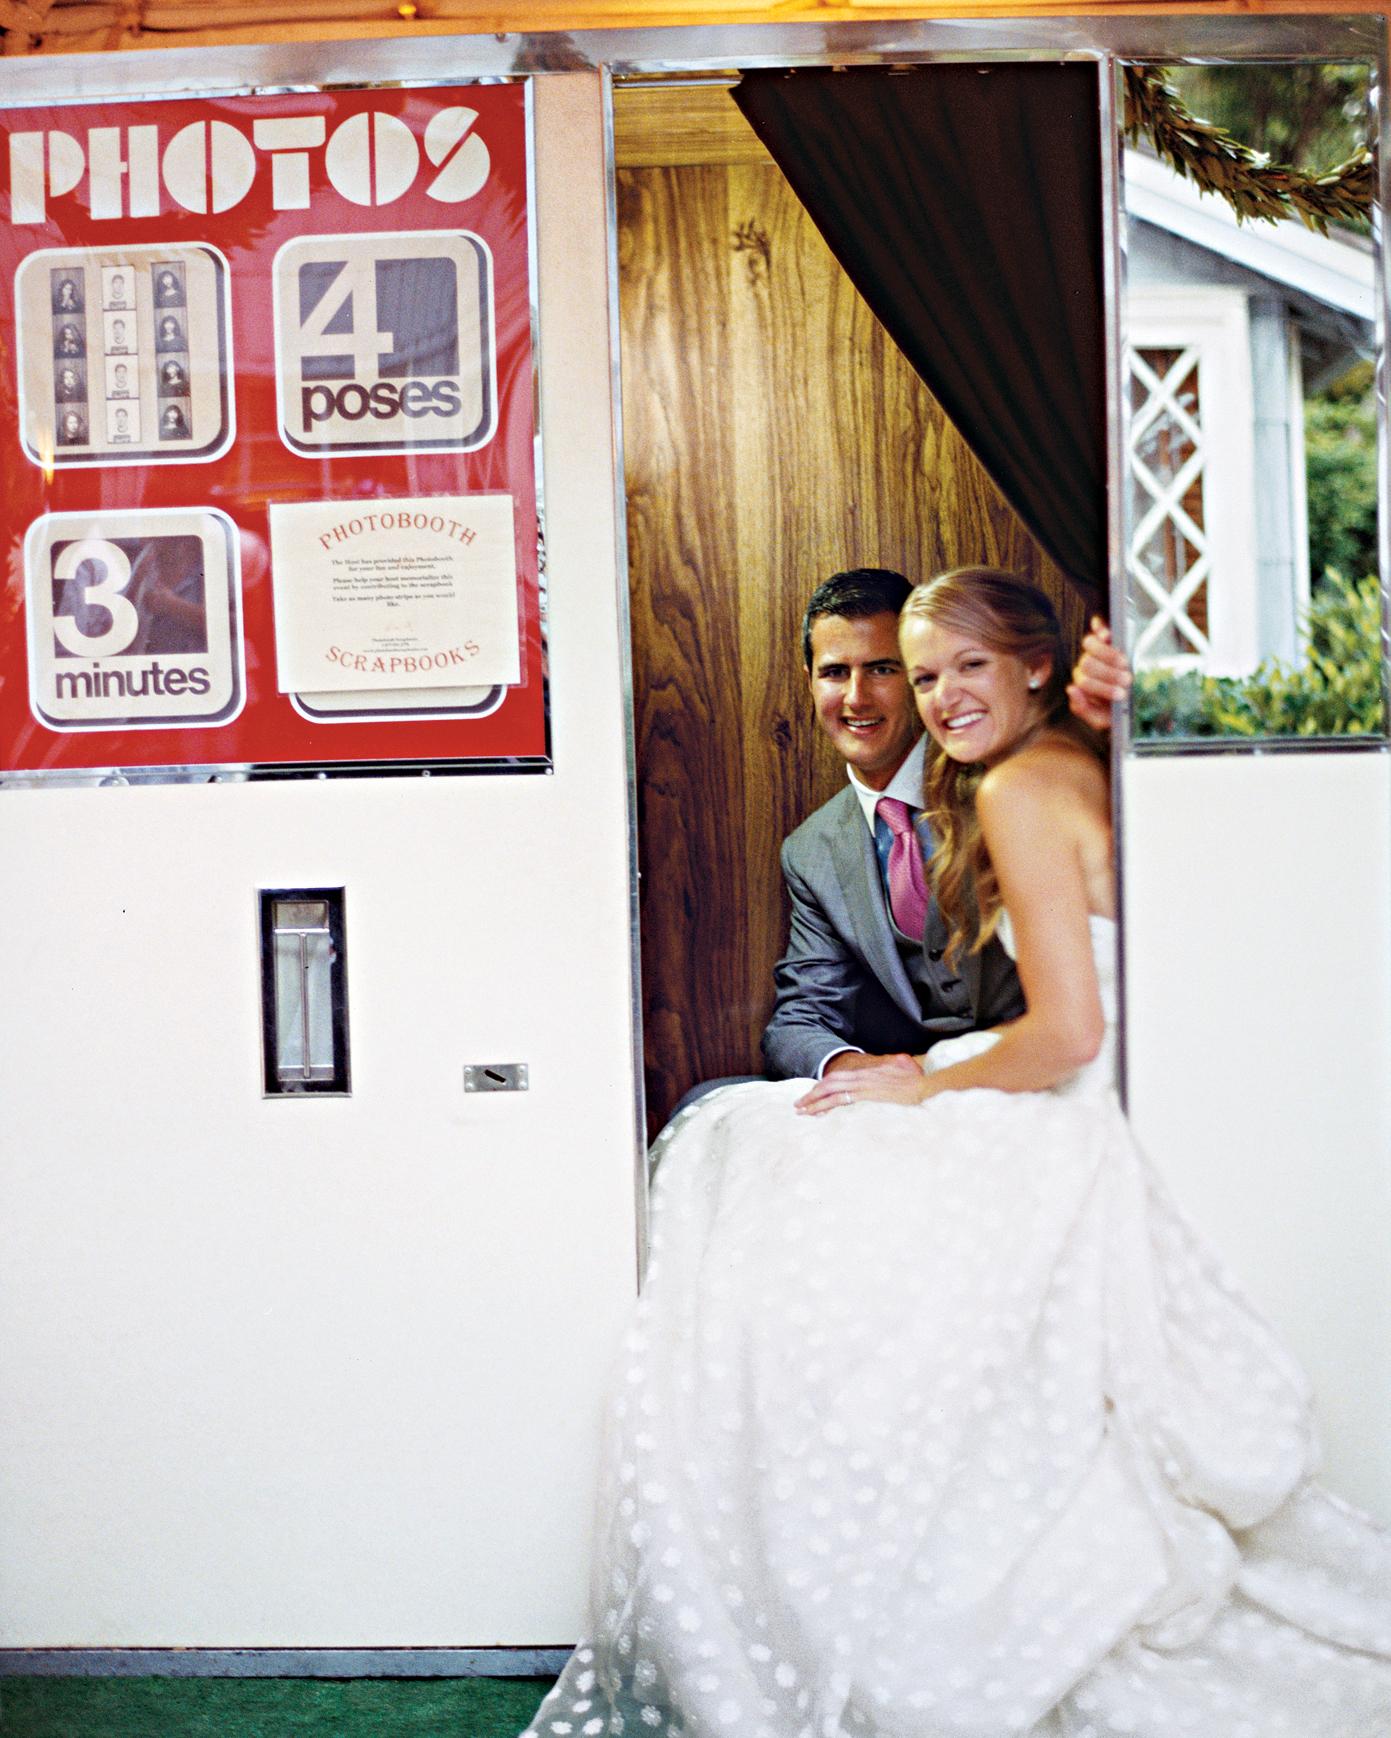 marriage-tips-lily-john-sum08-mwa103550-0215.jpg